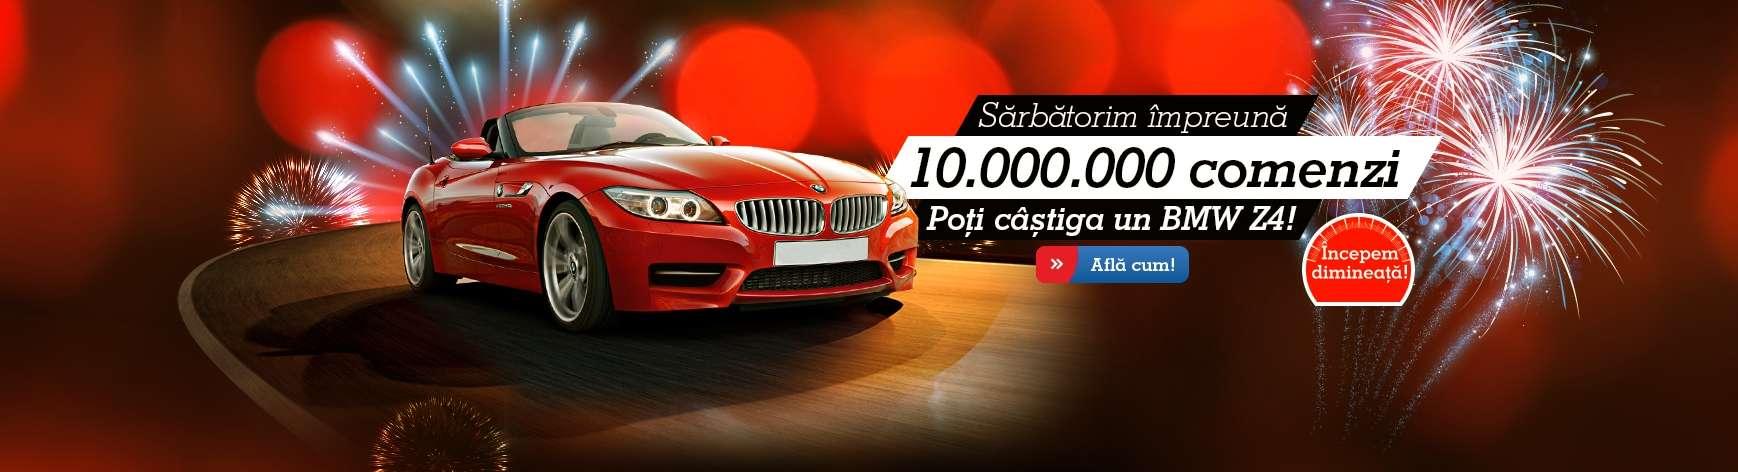 Concurs eMAG cu un BMW Z4 cadou pentru 10 milioane de comenzi